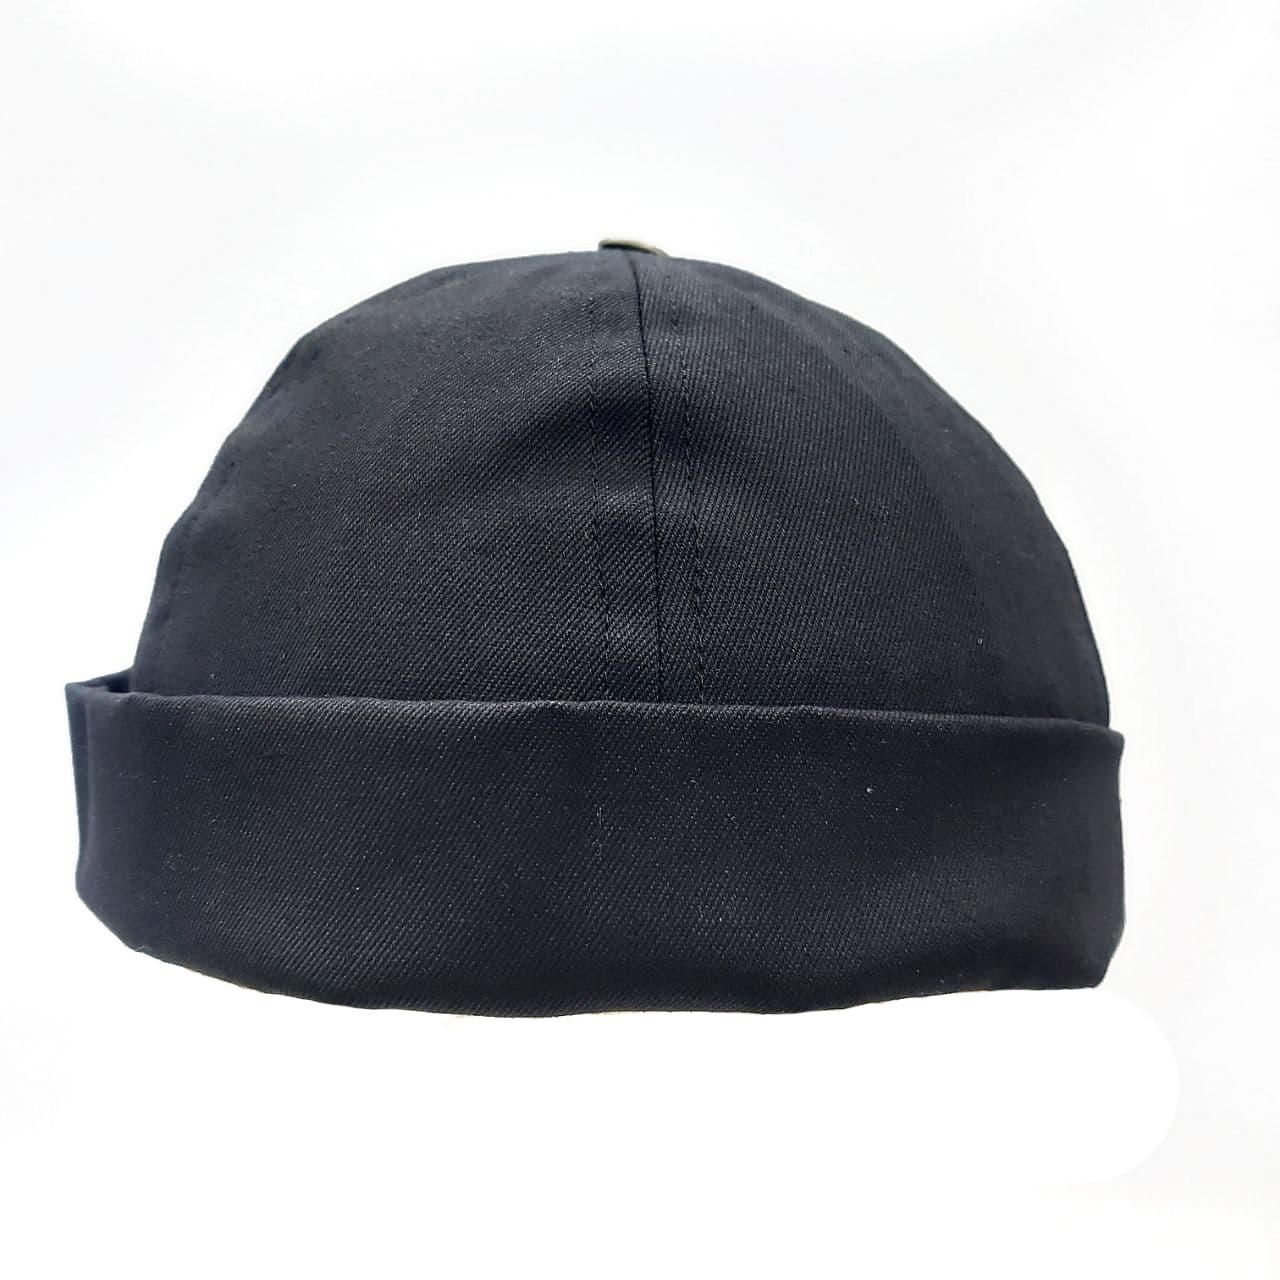 کلاه لئونی مردانه مدل ۰۰۱